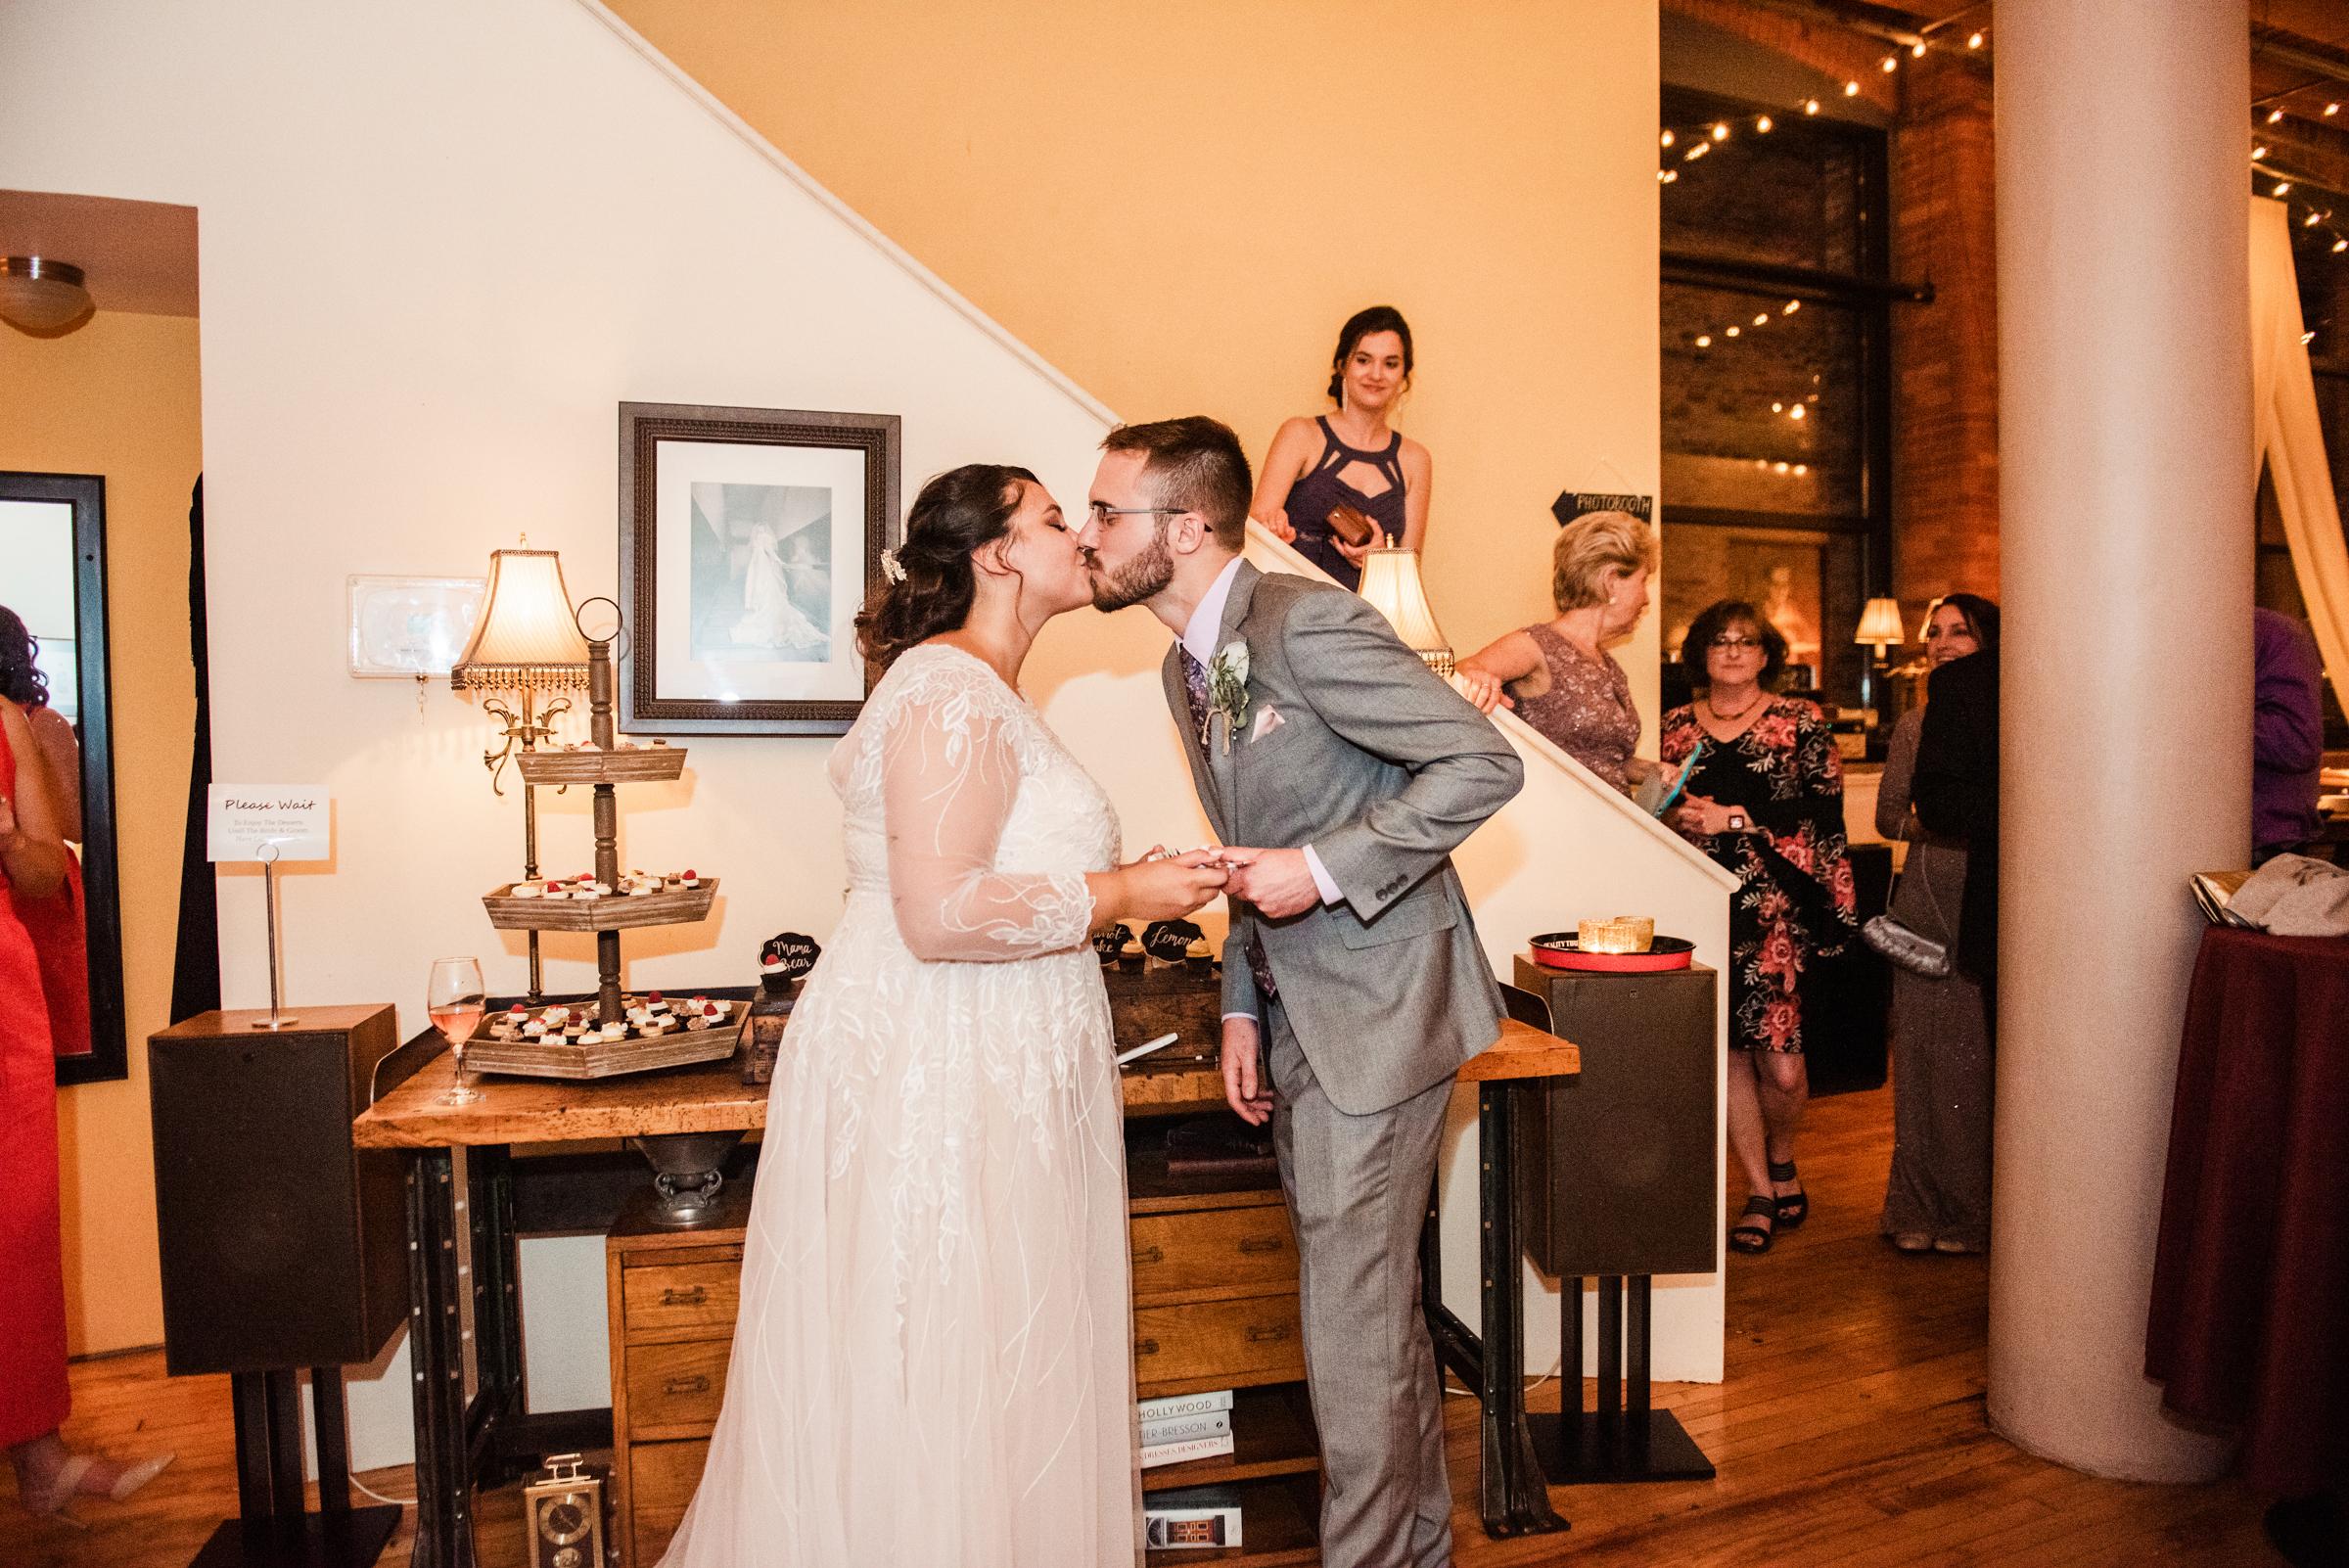 Studio_180_Lamberton_Conservatory_Rochester_Wedding_JILL_STUDIO_Rochester_NY_Photographer_DSC_9317.jpg